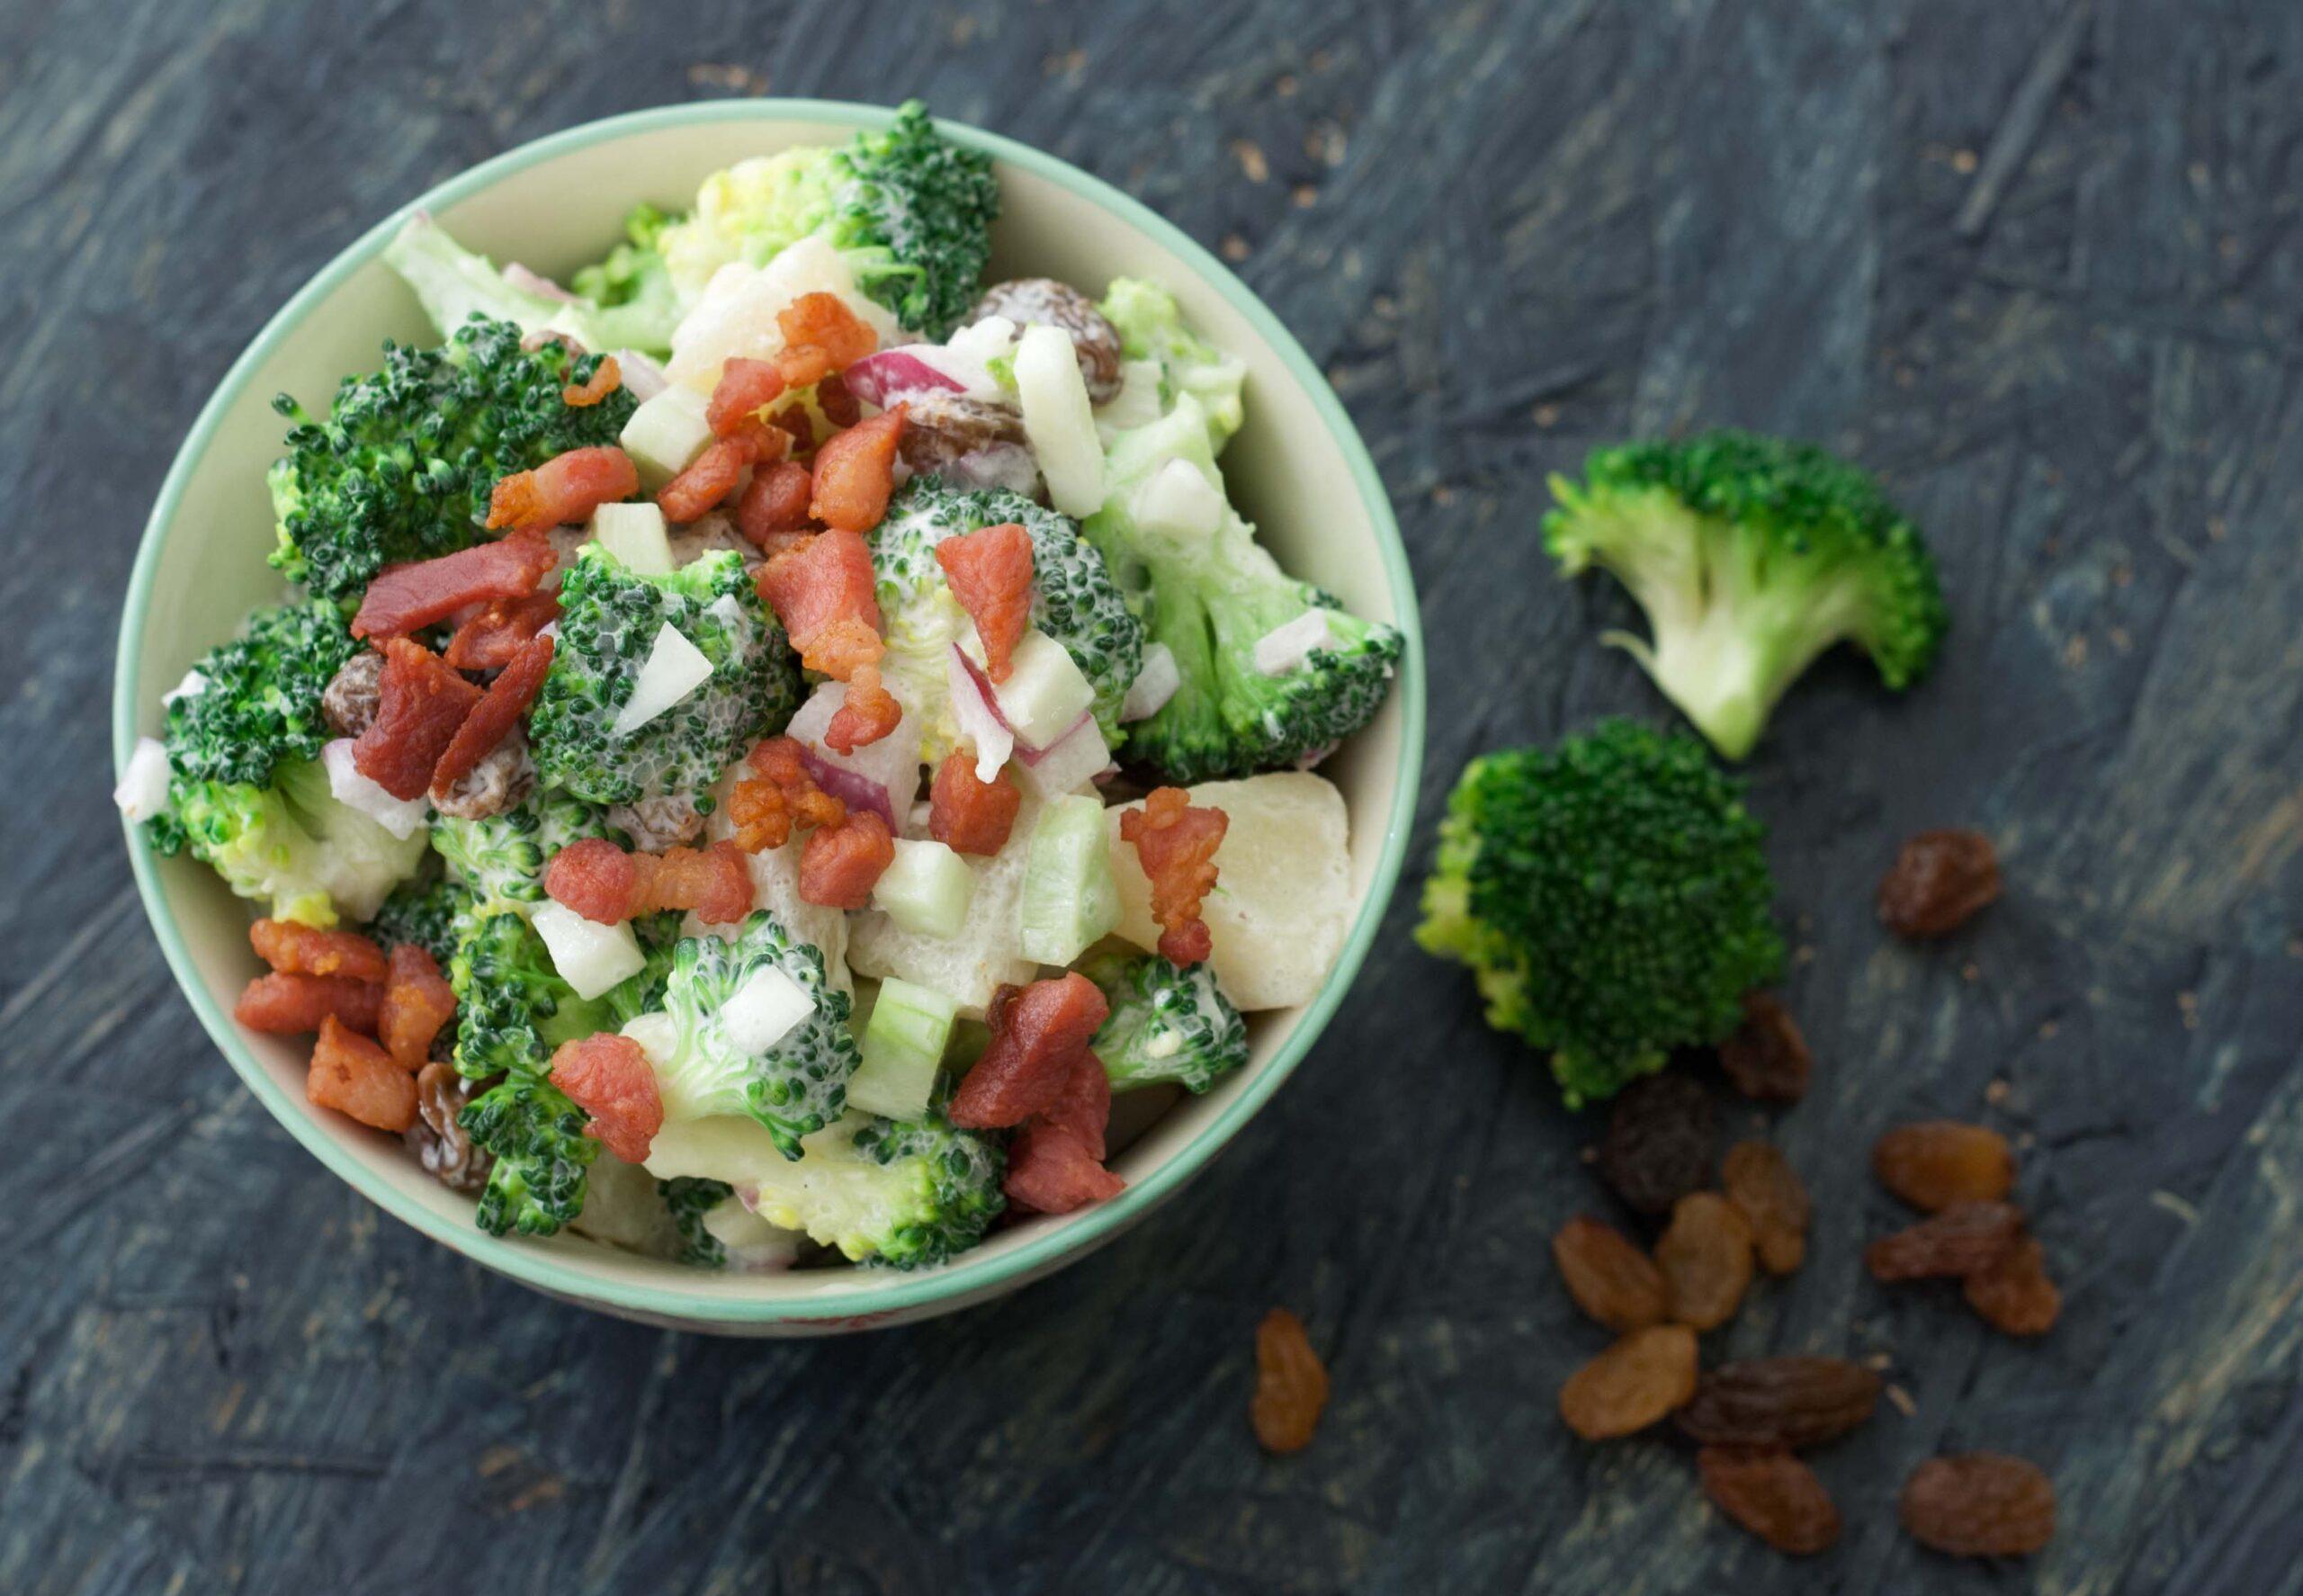 Homemade Danish broccoli salad